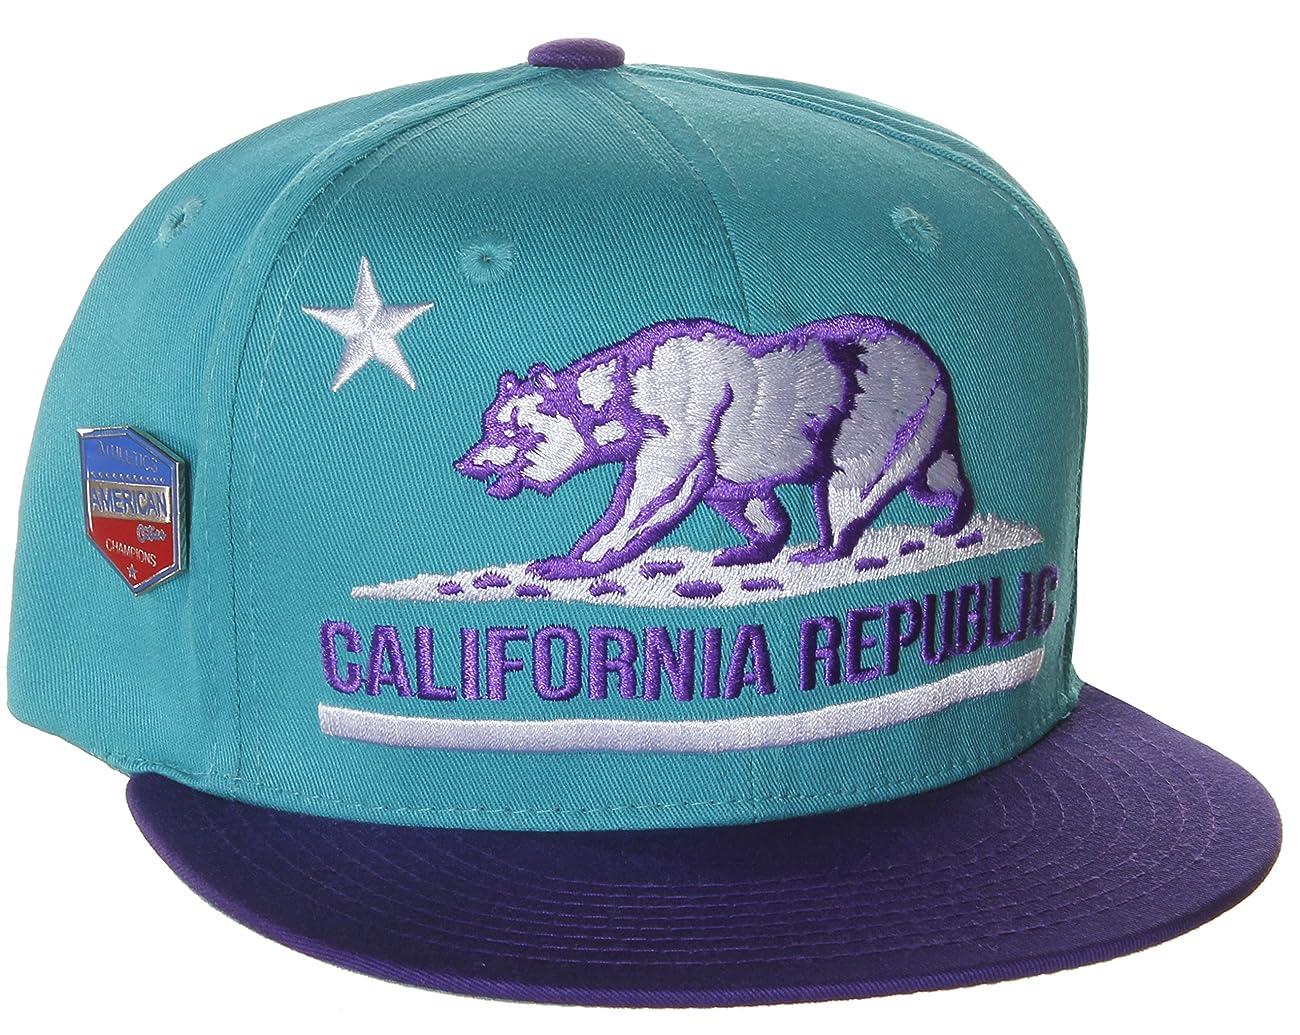 California Republic Flat Bill Vintage Style Snapback Hat Cap 0